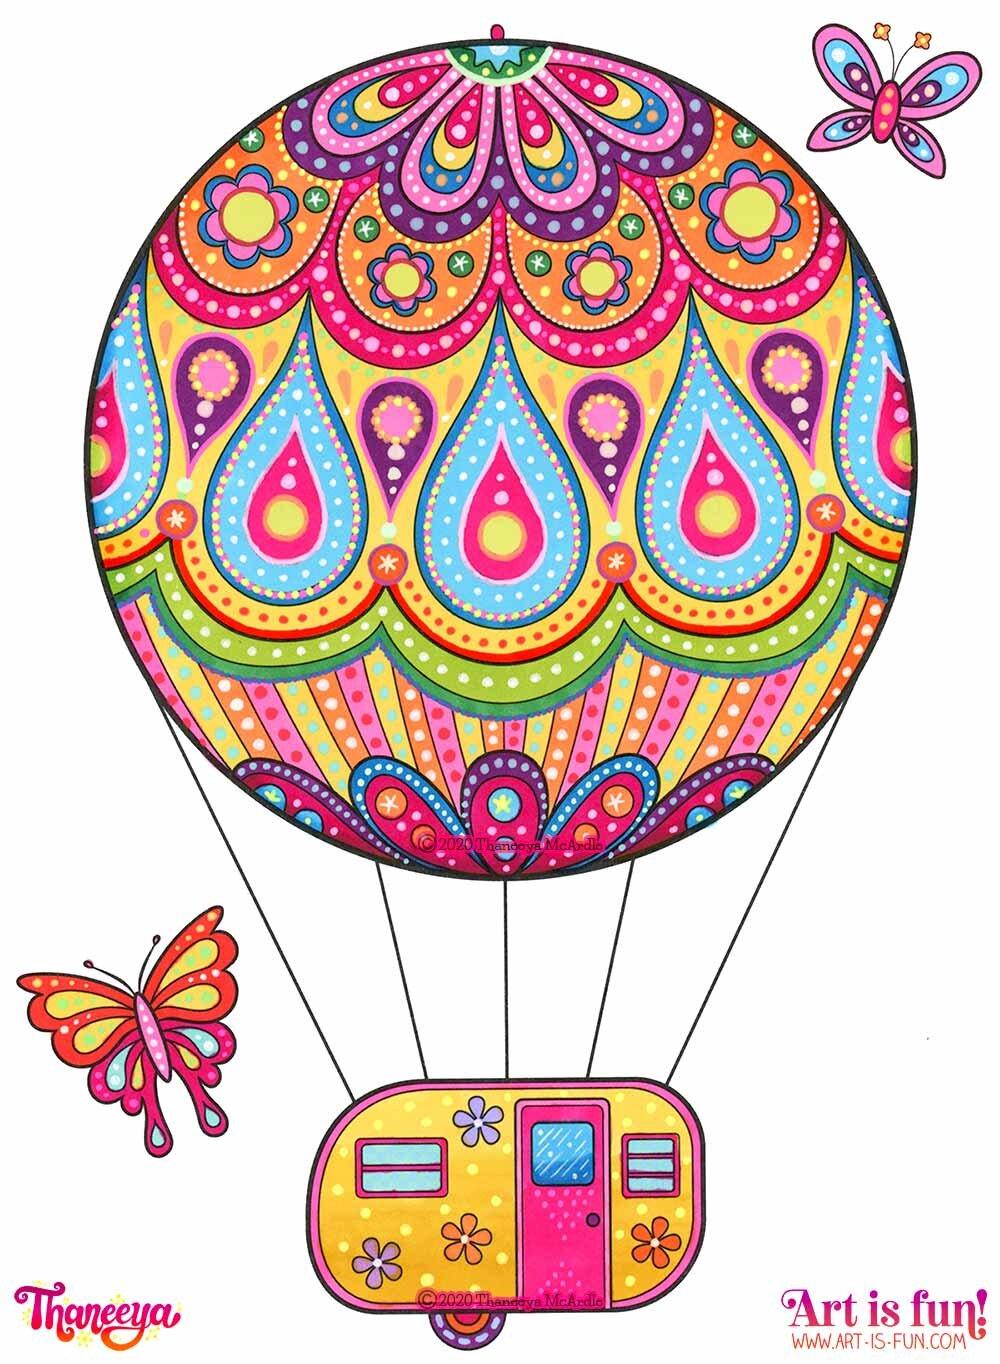 Thaneeya McArdle的快乐露营者涂色书中的热必威西蒙体育 欧盟体育气球露营者,用Ohuhu酒精记号笔和Sakurbetway必威官网appa Gelly卷笔涂色